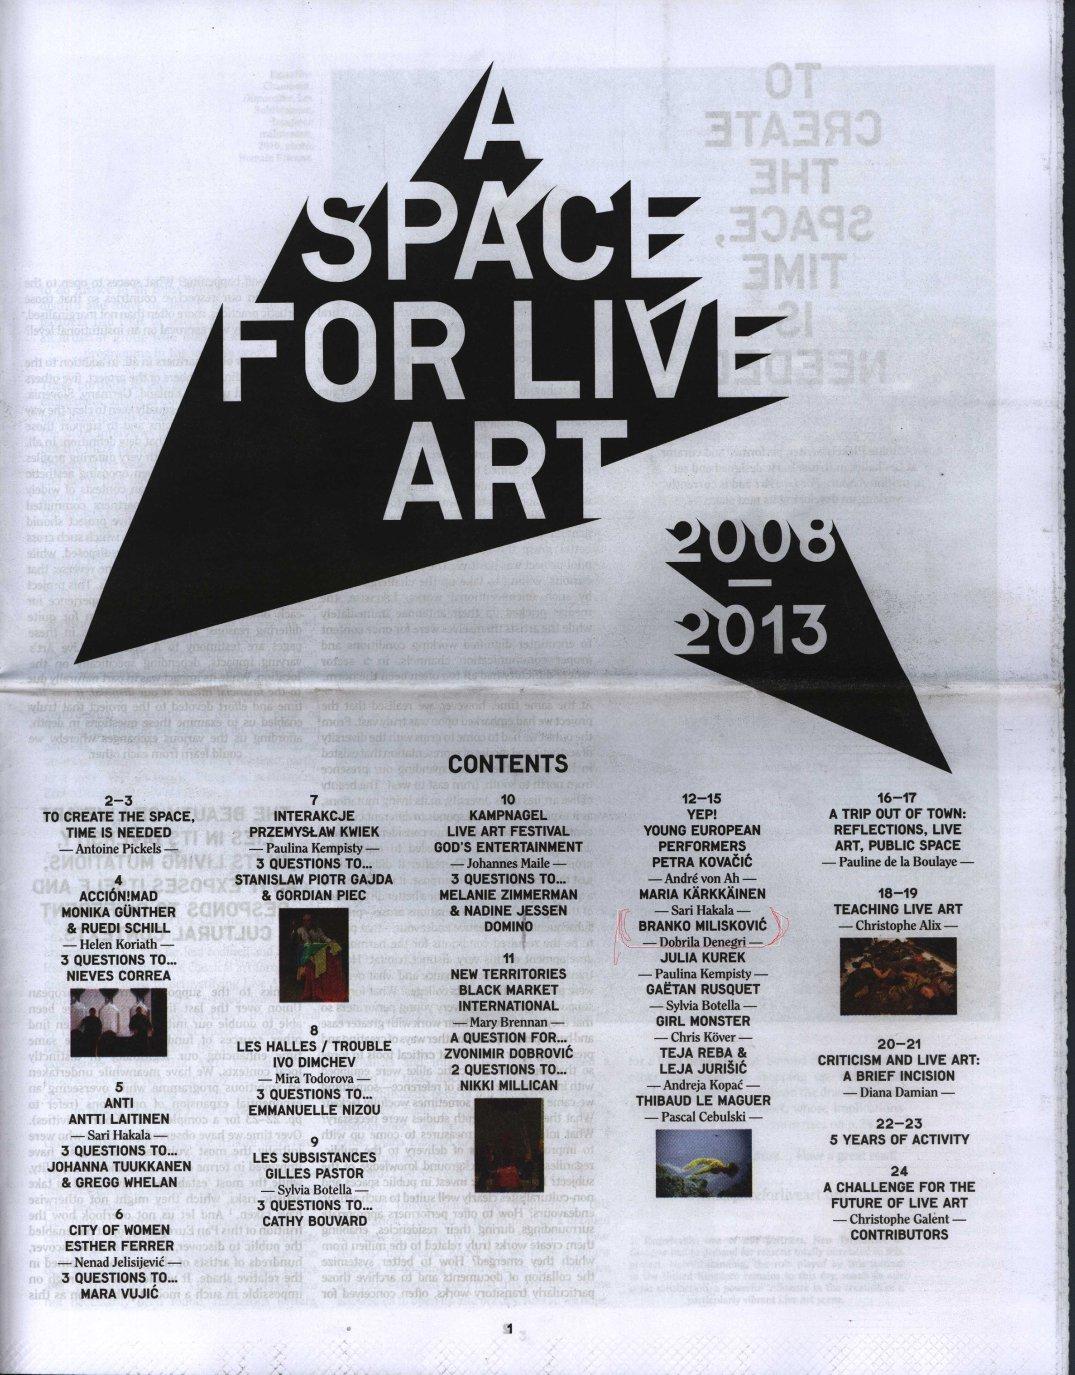 live art front page Kopie